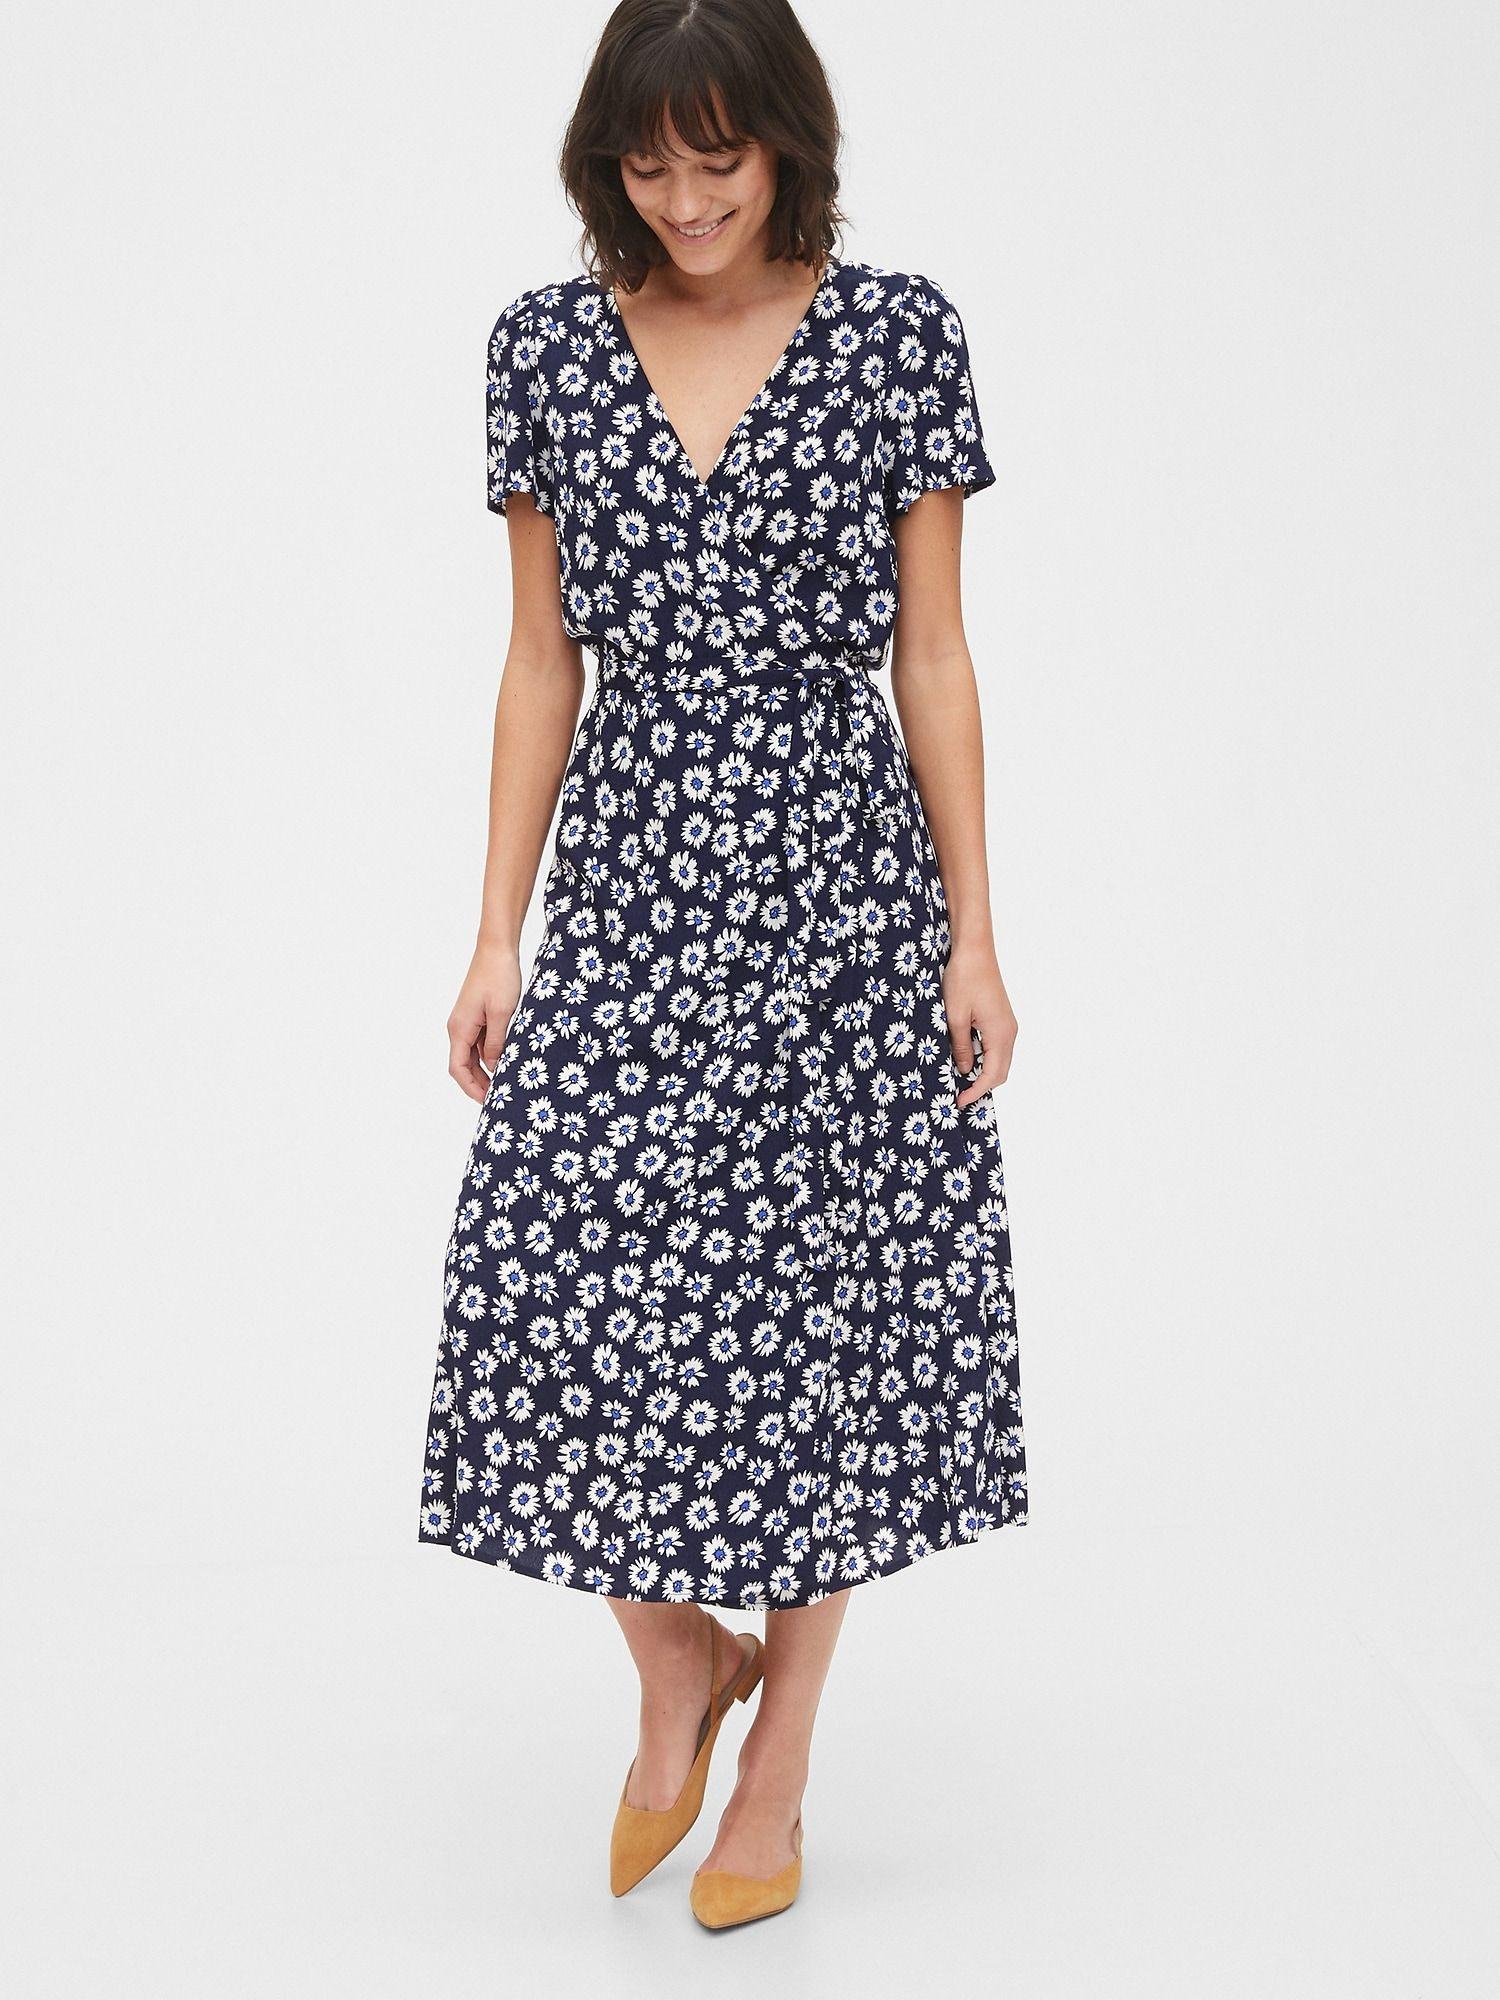 Midi Wrap Dress Gap Midi Wrap Dress Wrap Dress Casual Dresses For Women [ 2000 x 1500 Pixel ]